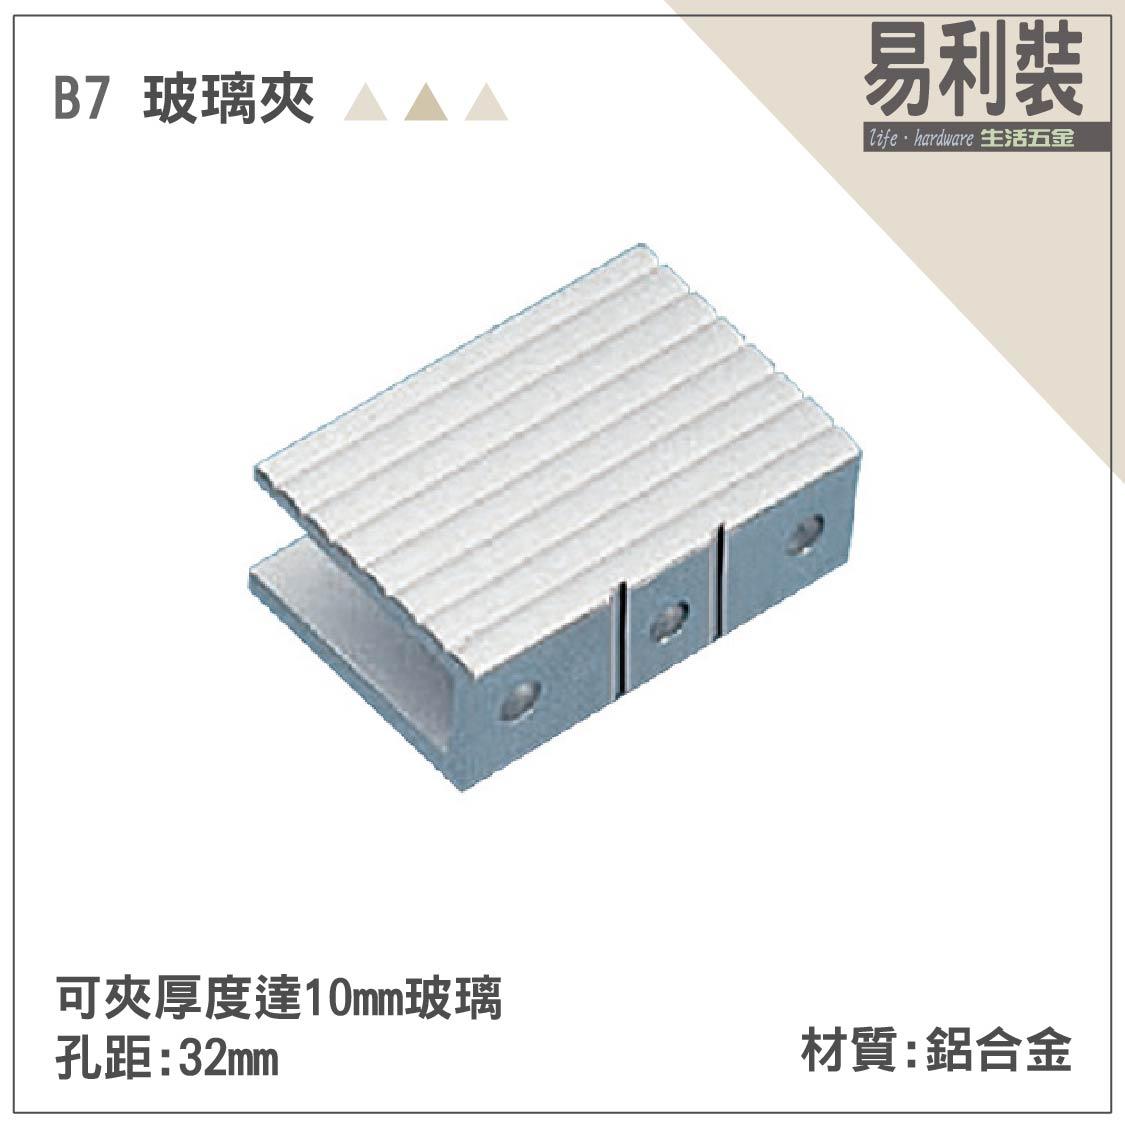 【 EASYCAN  】B7 玻璃夾 易利裝生活五金 浴室 廚房 房間 臥房 衣櫃 小資族 辦公家具 系統家具 0